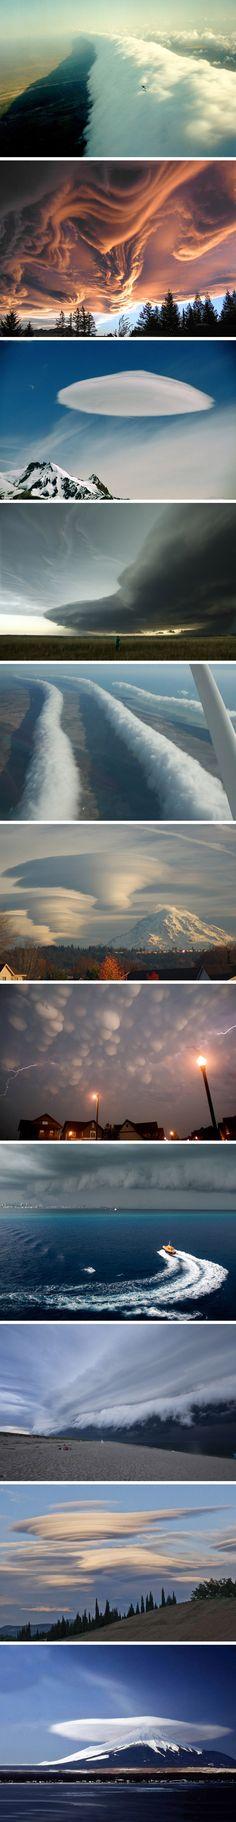 clouds, sky, amaz, weather, beauti, natur fineri, earth, awesom cloud, crazi cloud